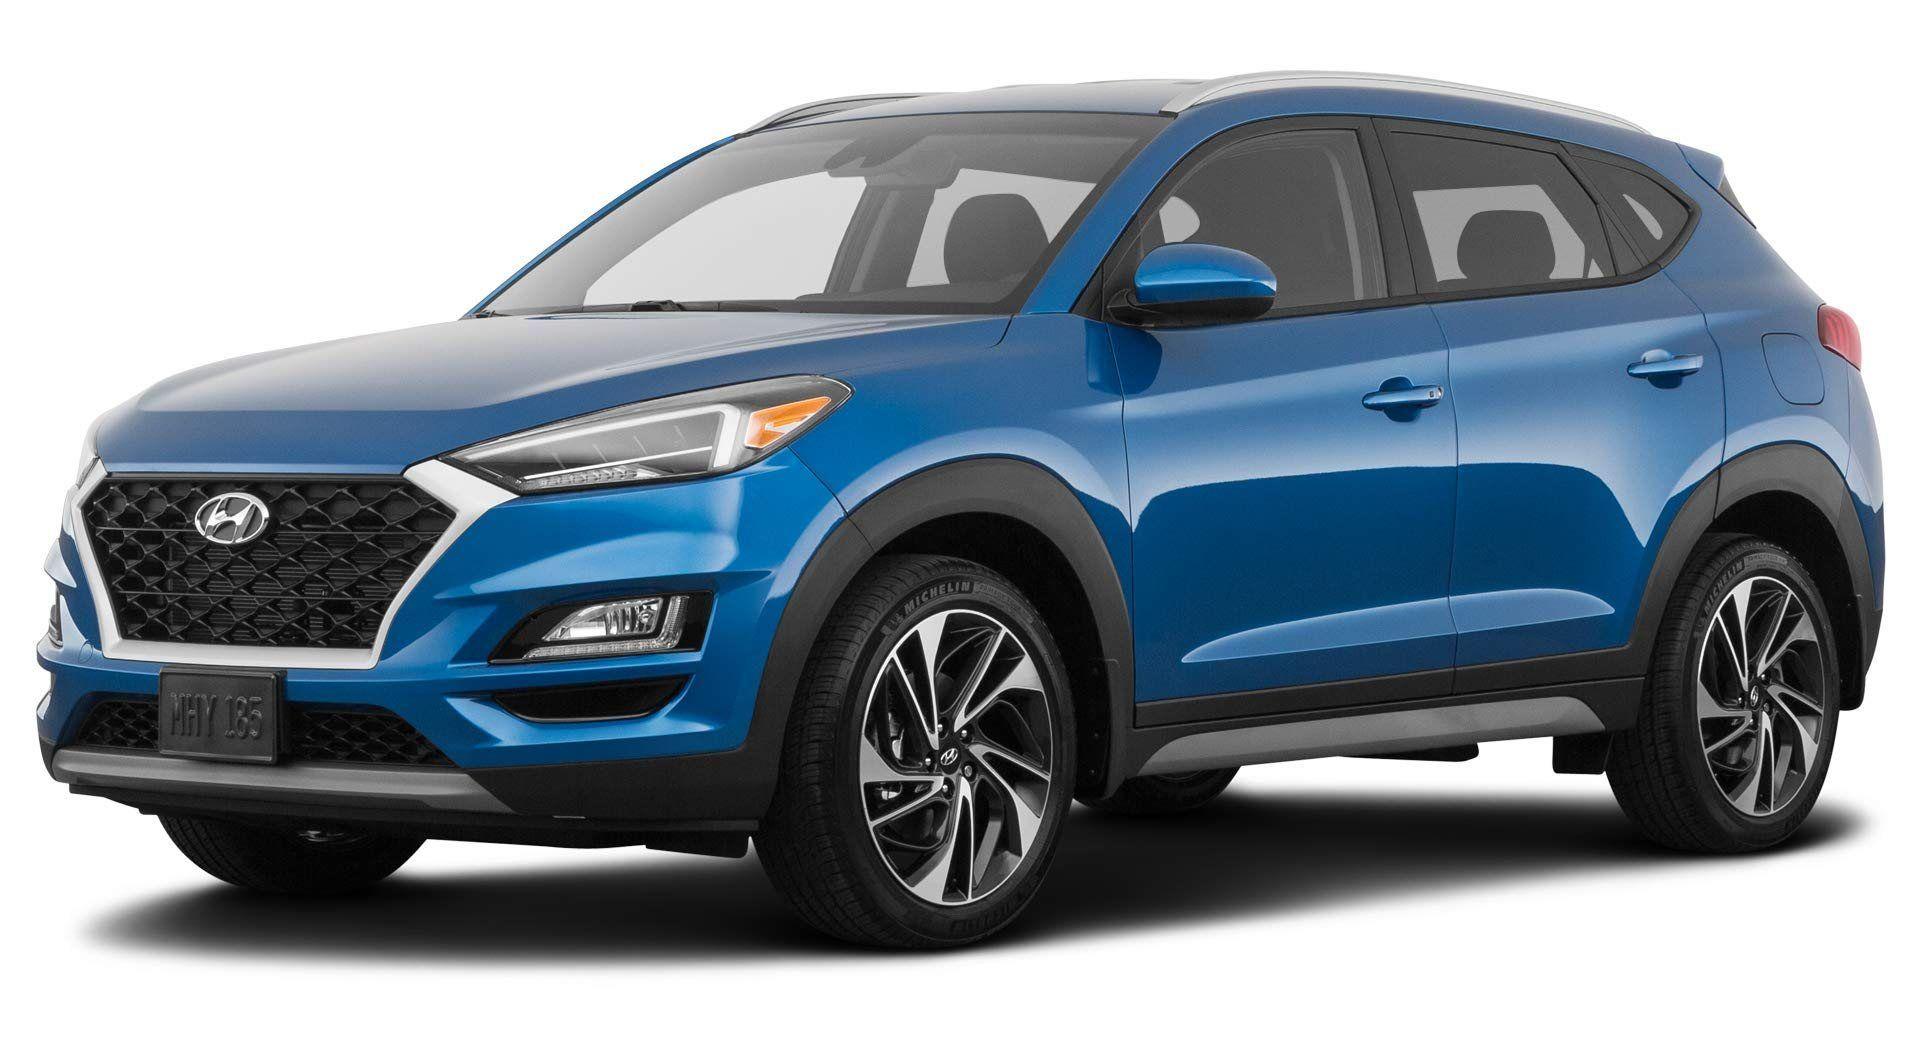 2021 Mazda Cx 9 Price and Release Date in 2020 Mazda cx